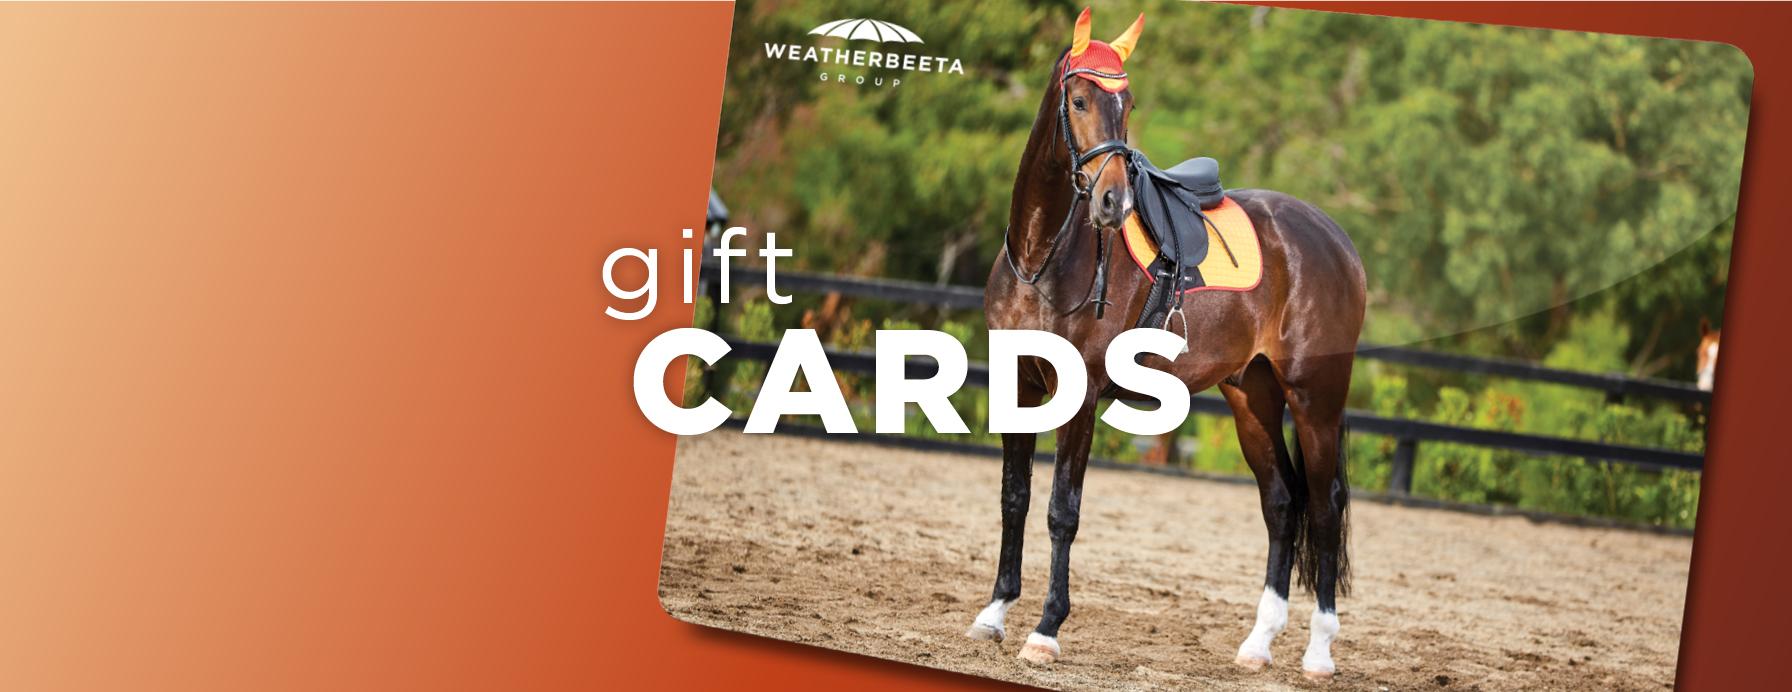 weatherbeeta gift cards